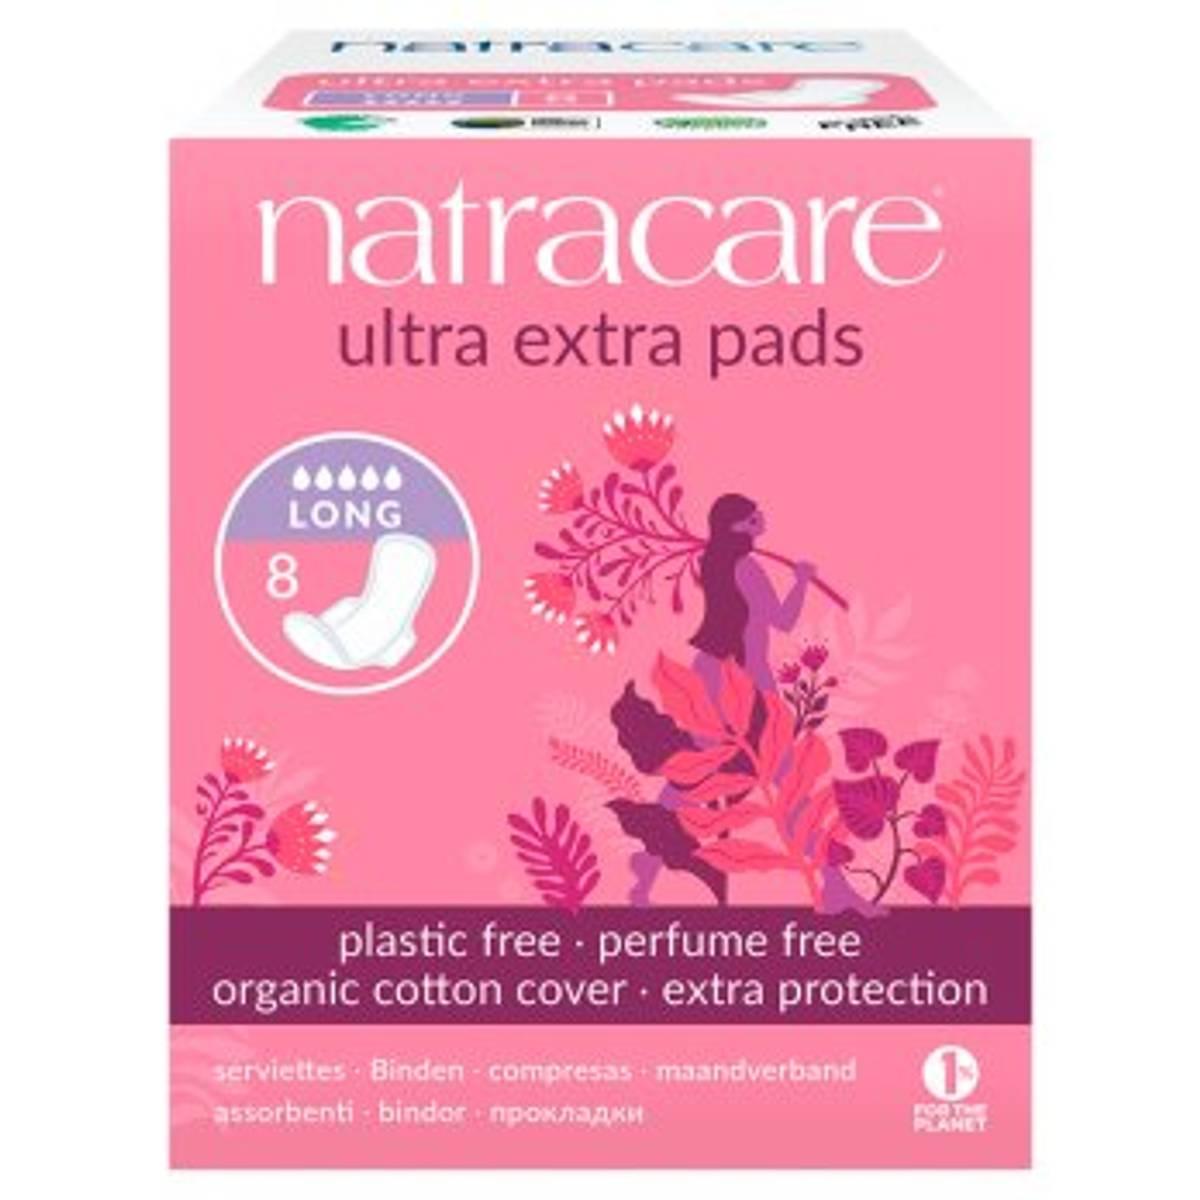 8 stk LANG ultra extra pads, økologiske bind / Natracare